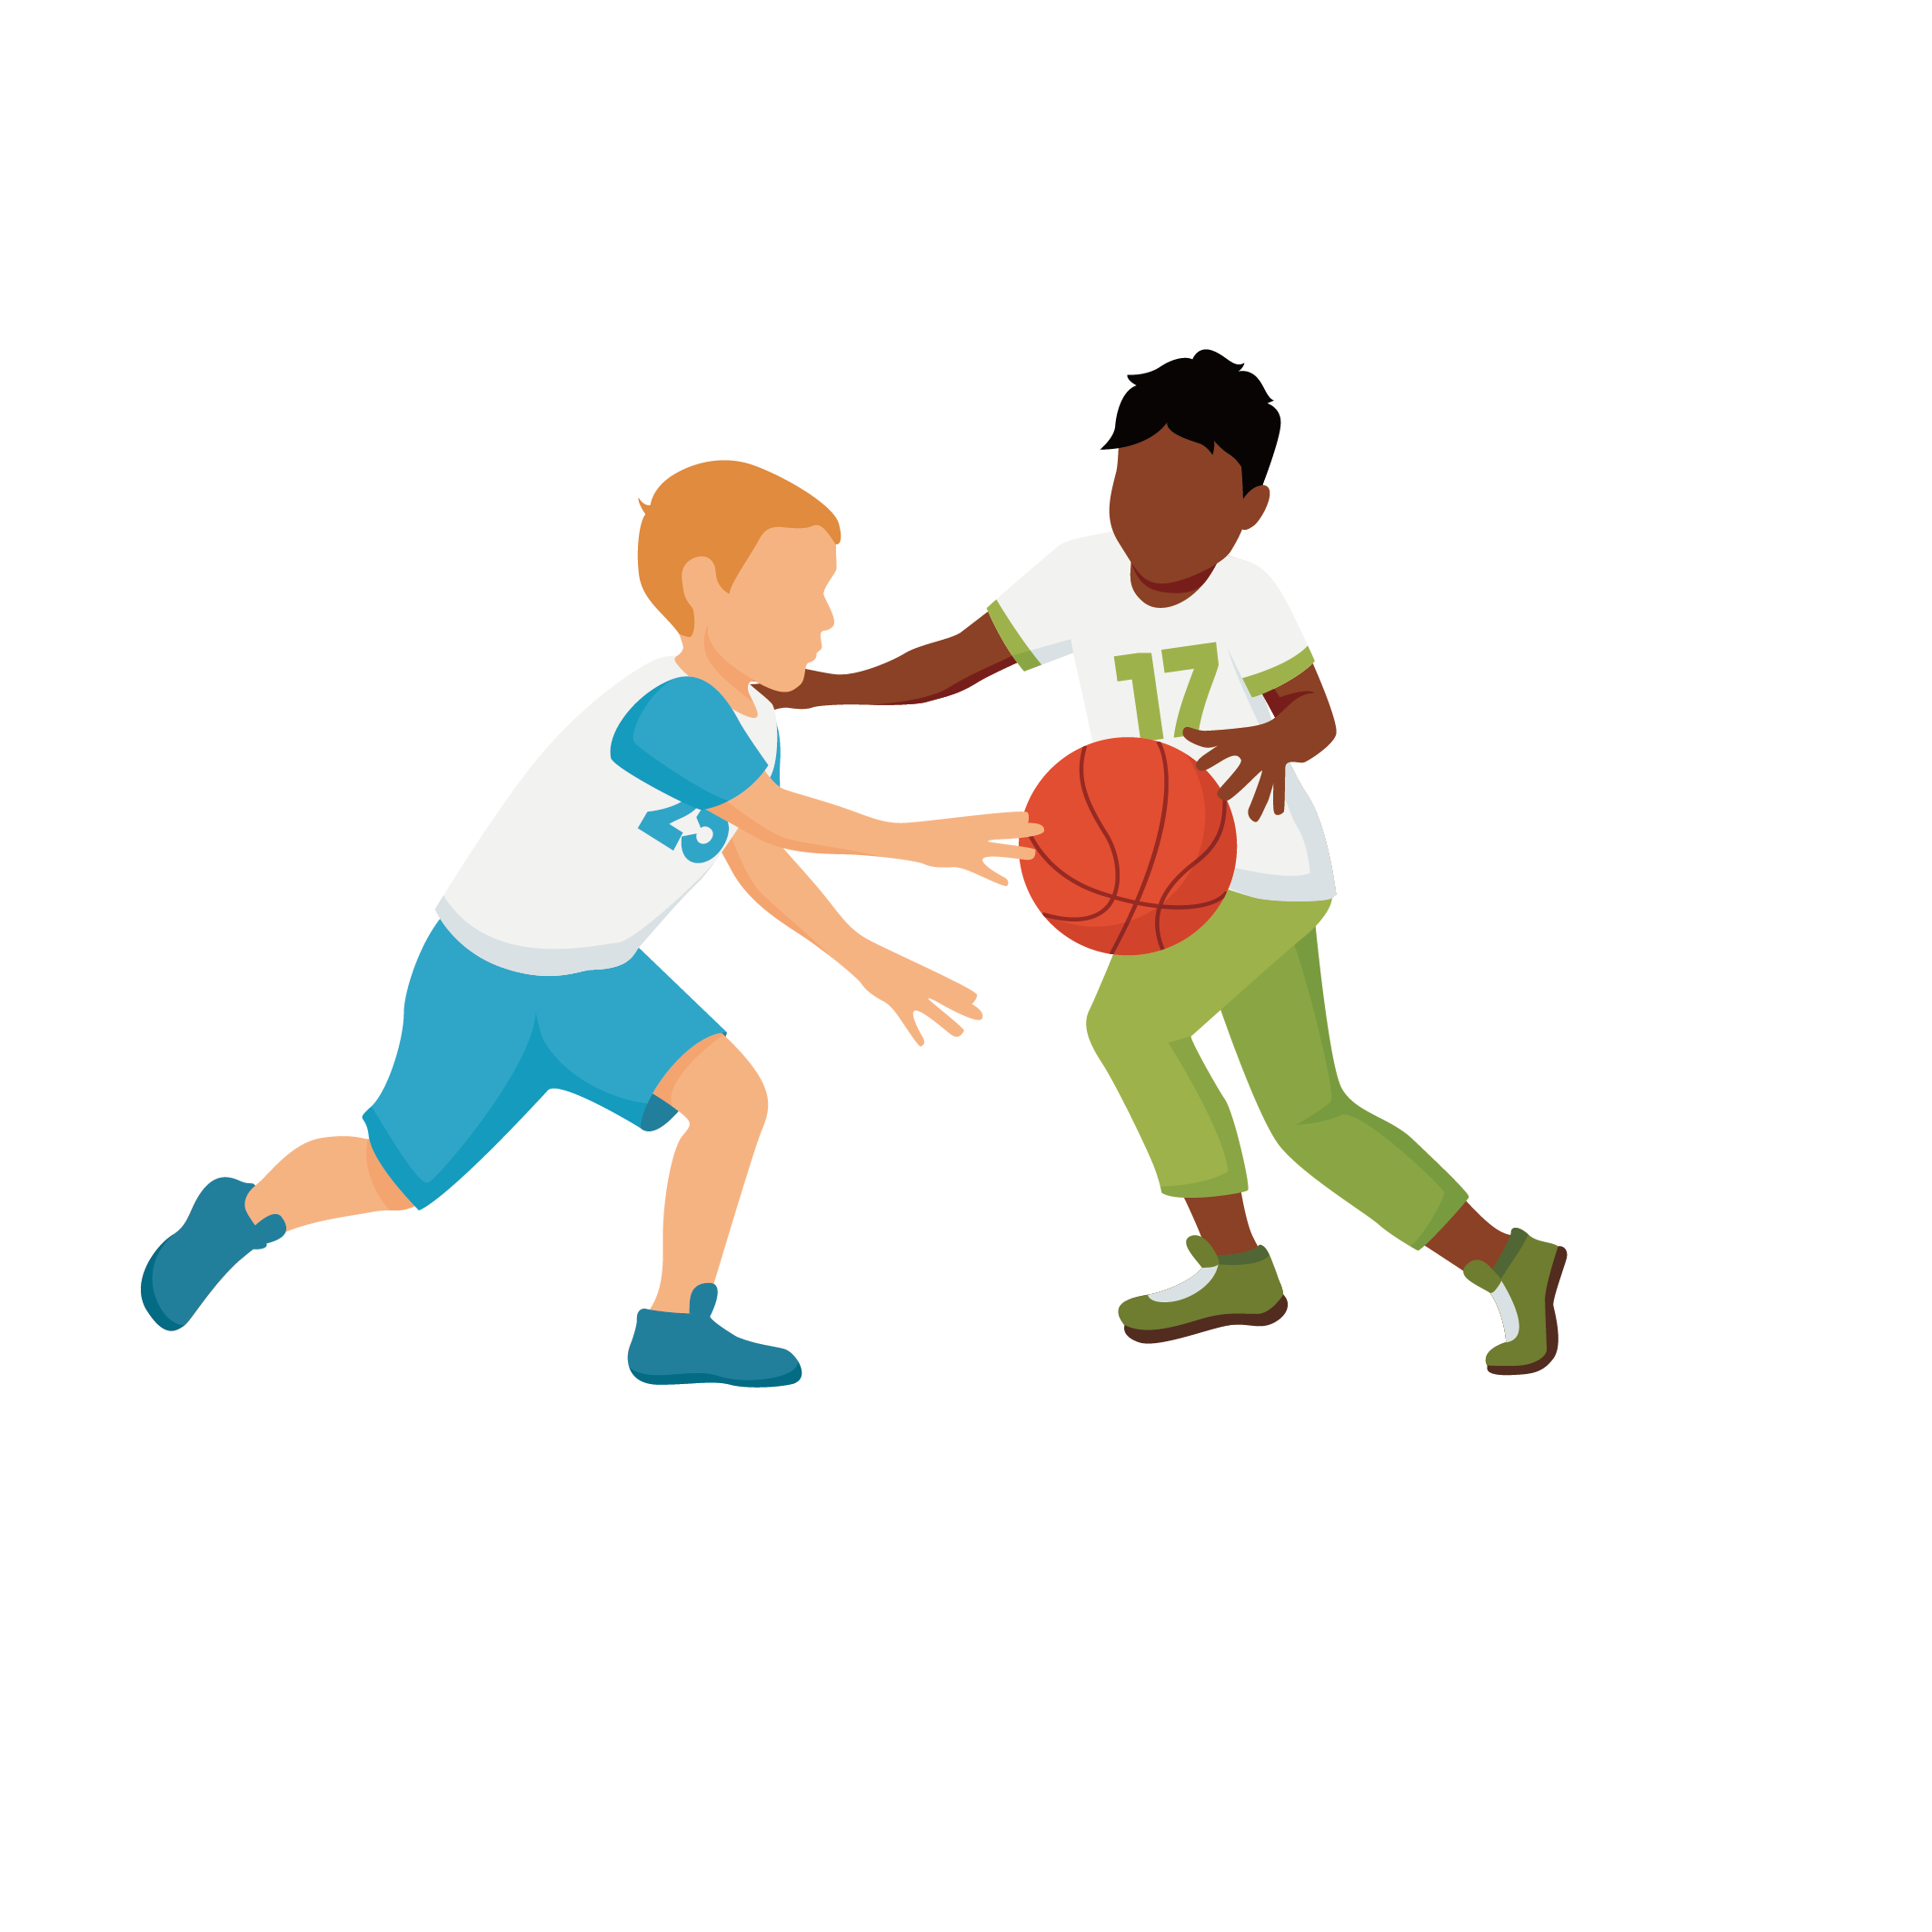 Enfants jouant au football ensemble